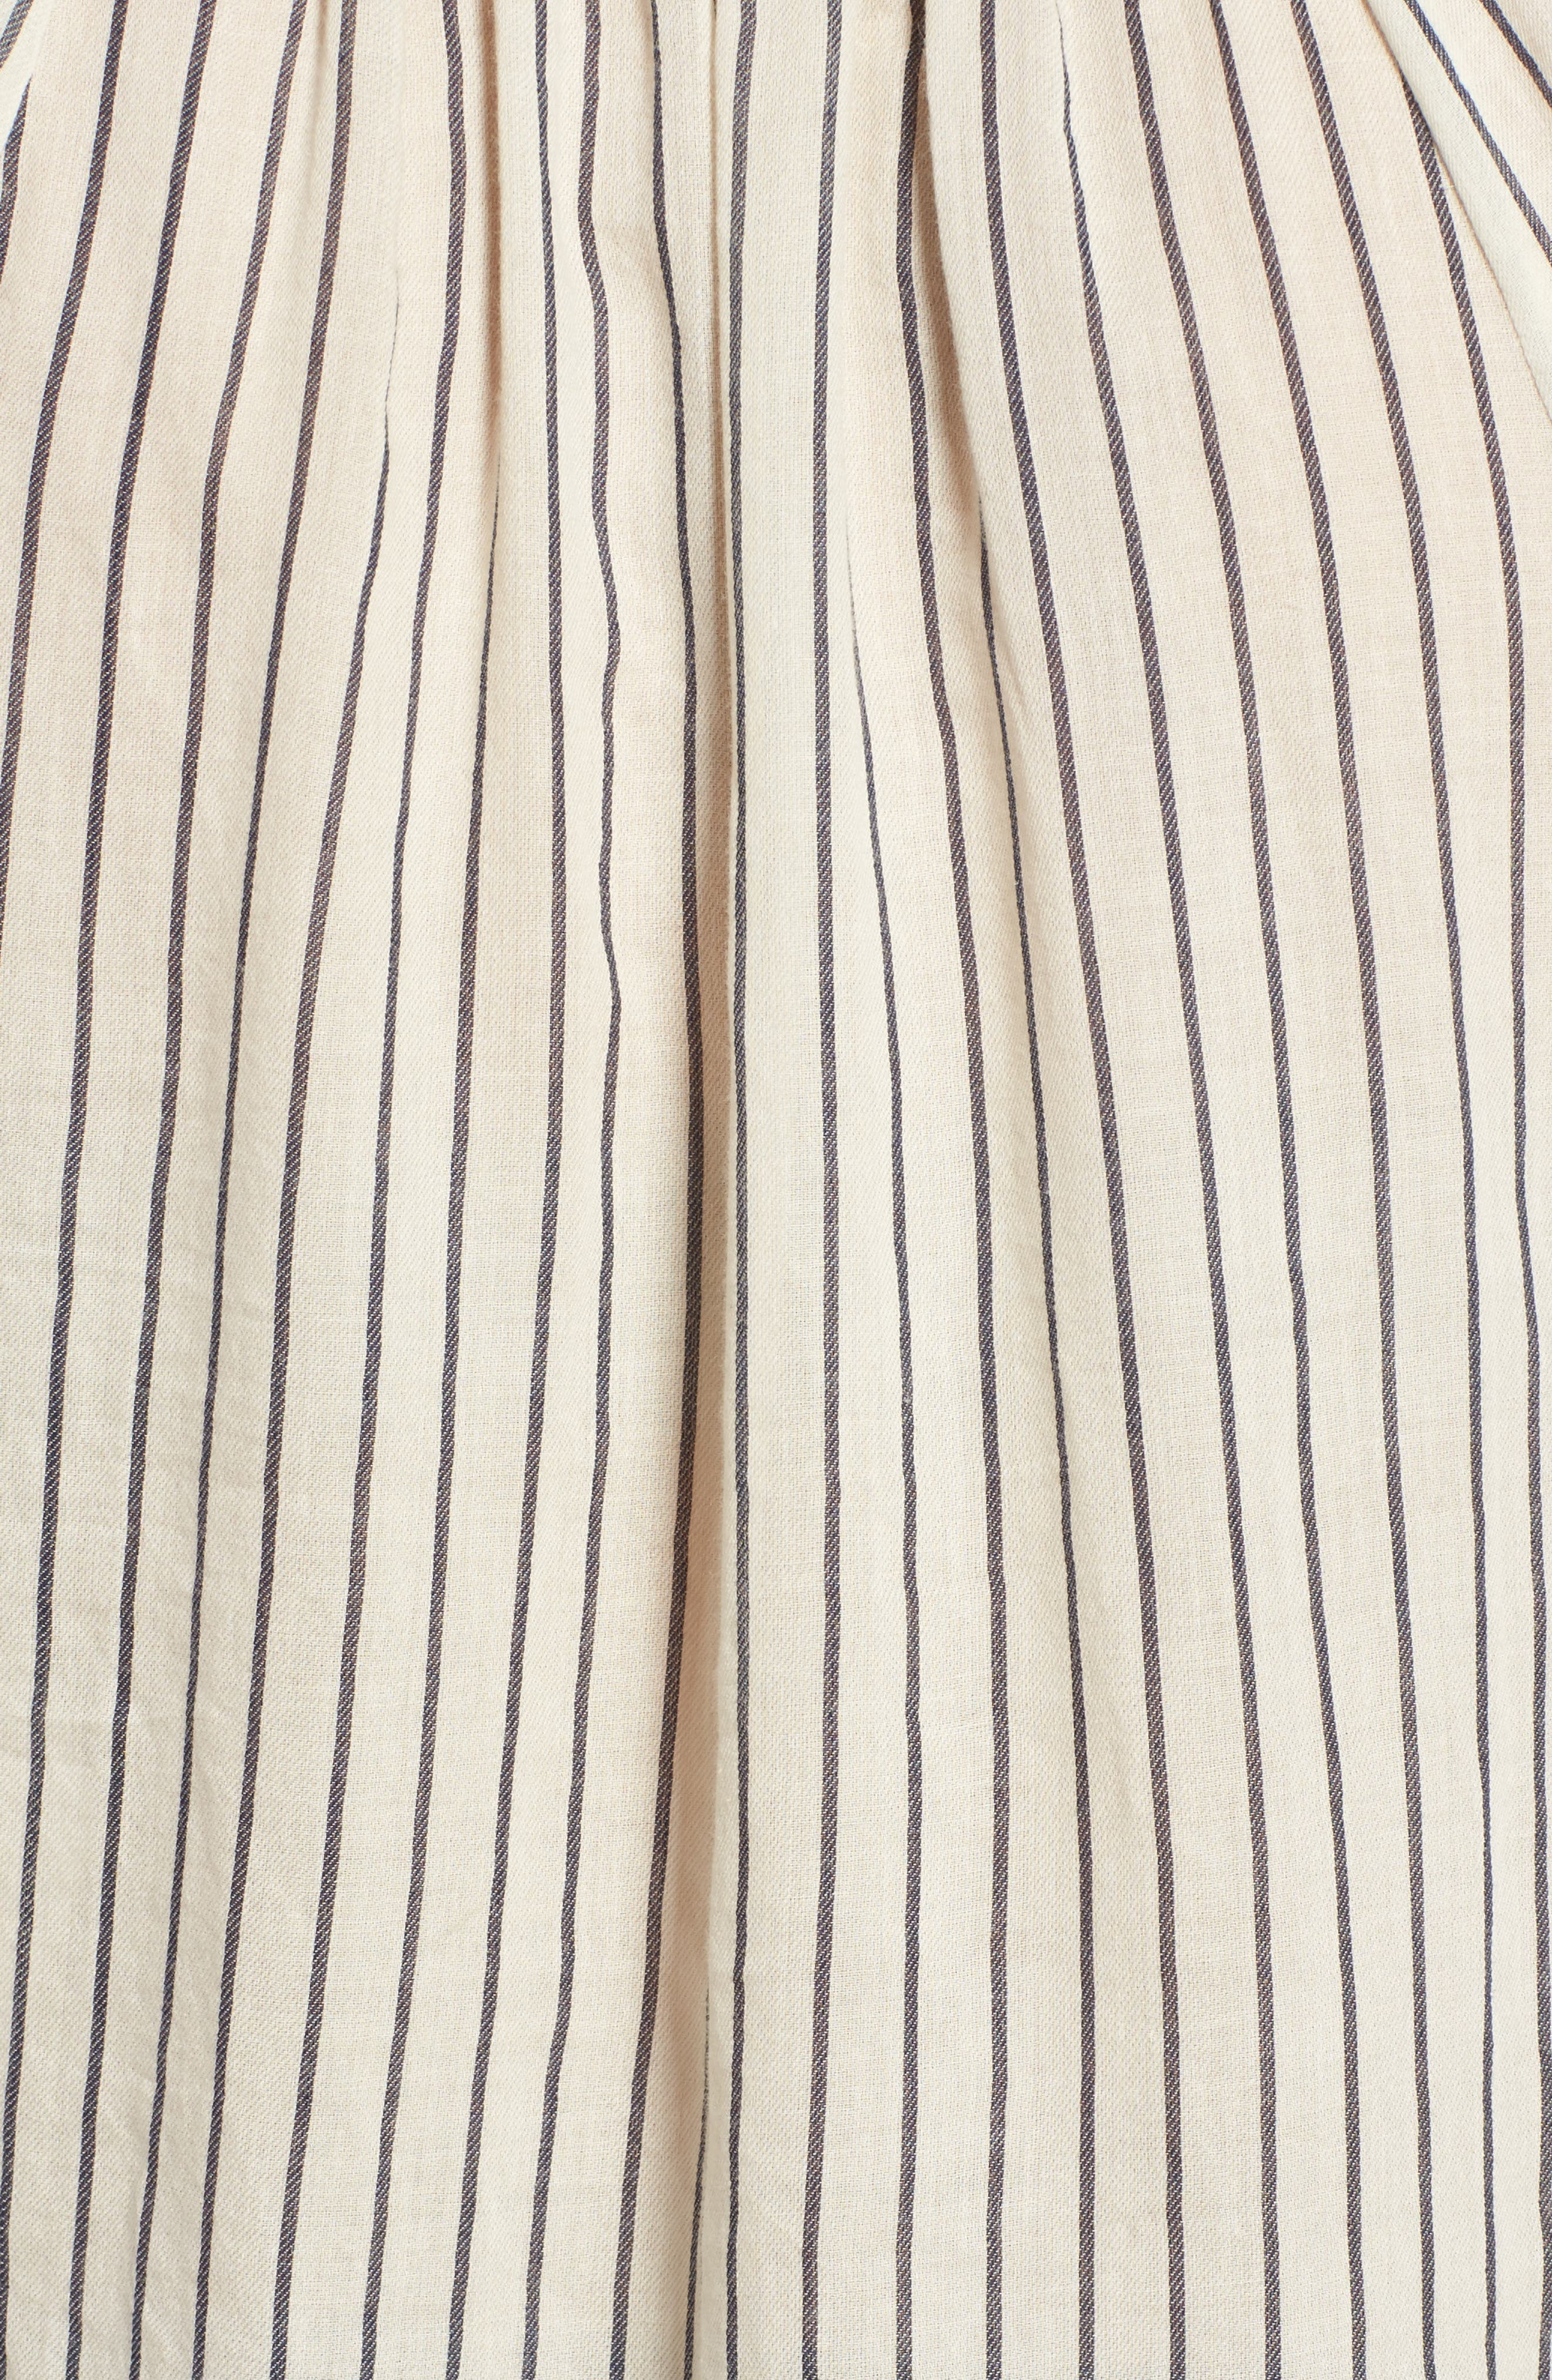 Stripe Peasant Blouse,                             Alternate thumbnail 5, color,